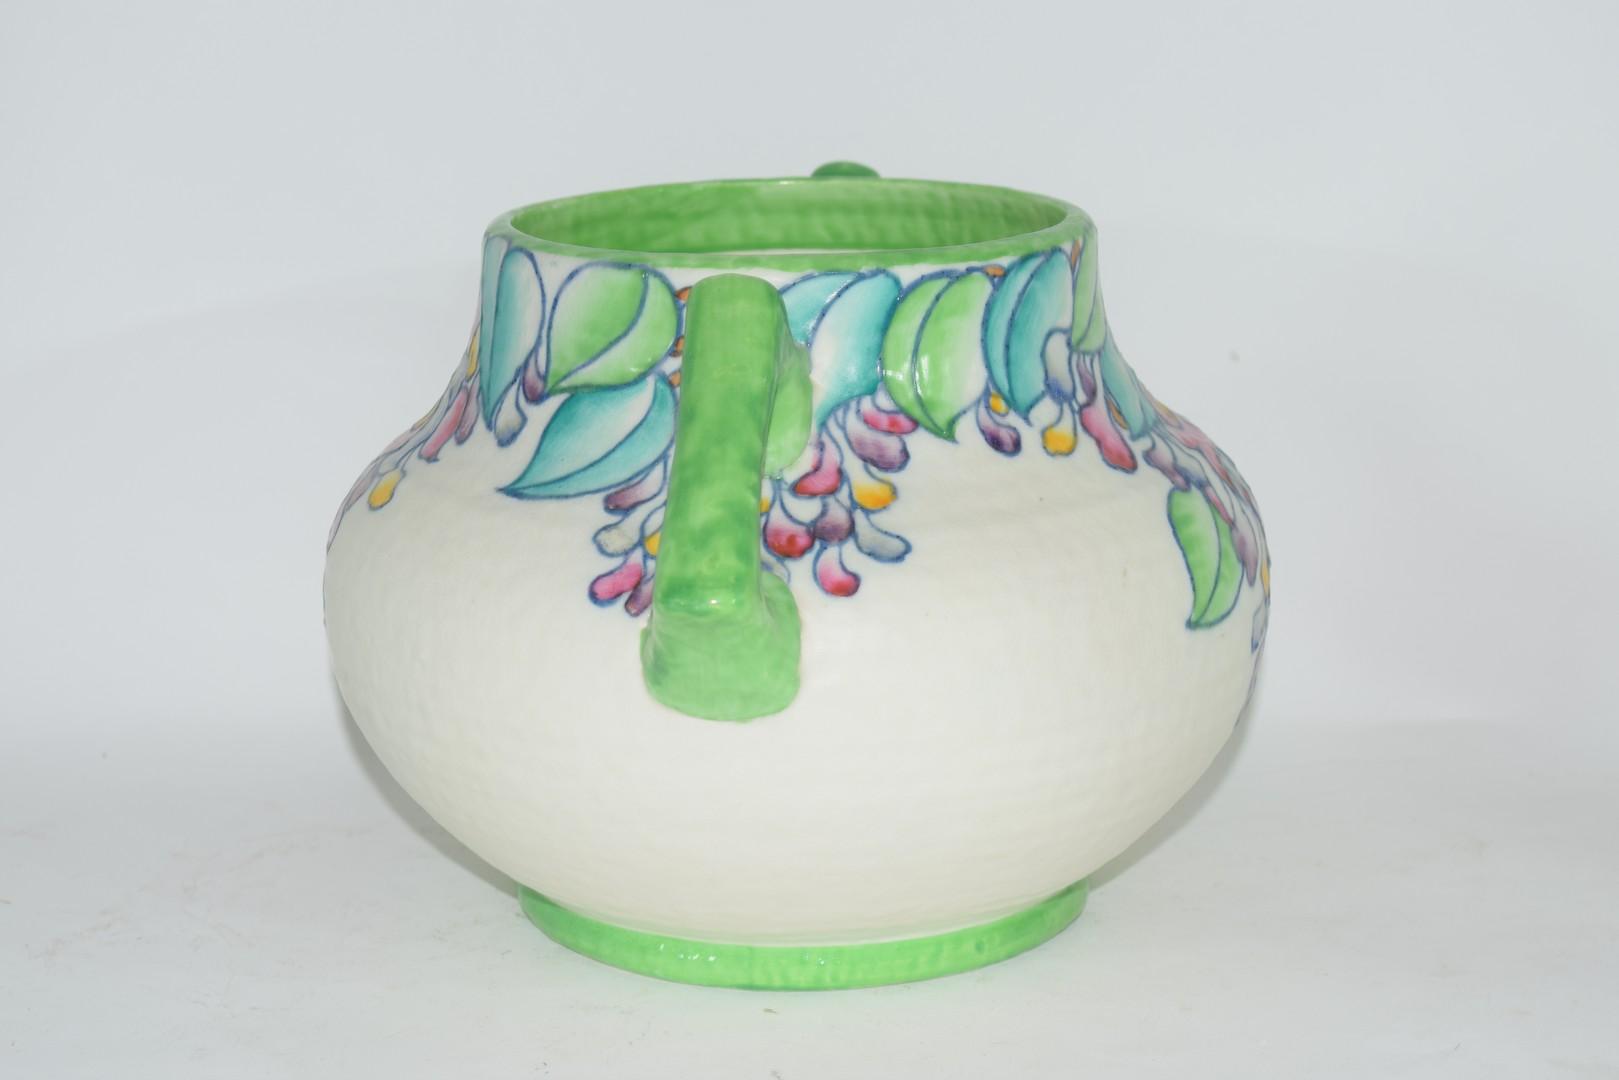 Charlotte Rhead vase pattern no 4954 - Image 2 of 6